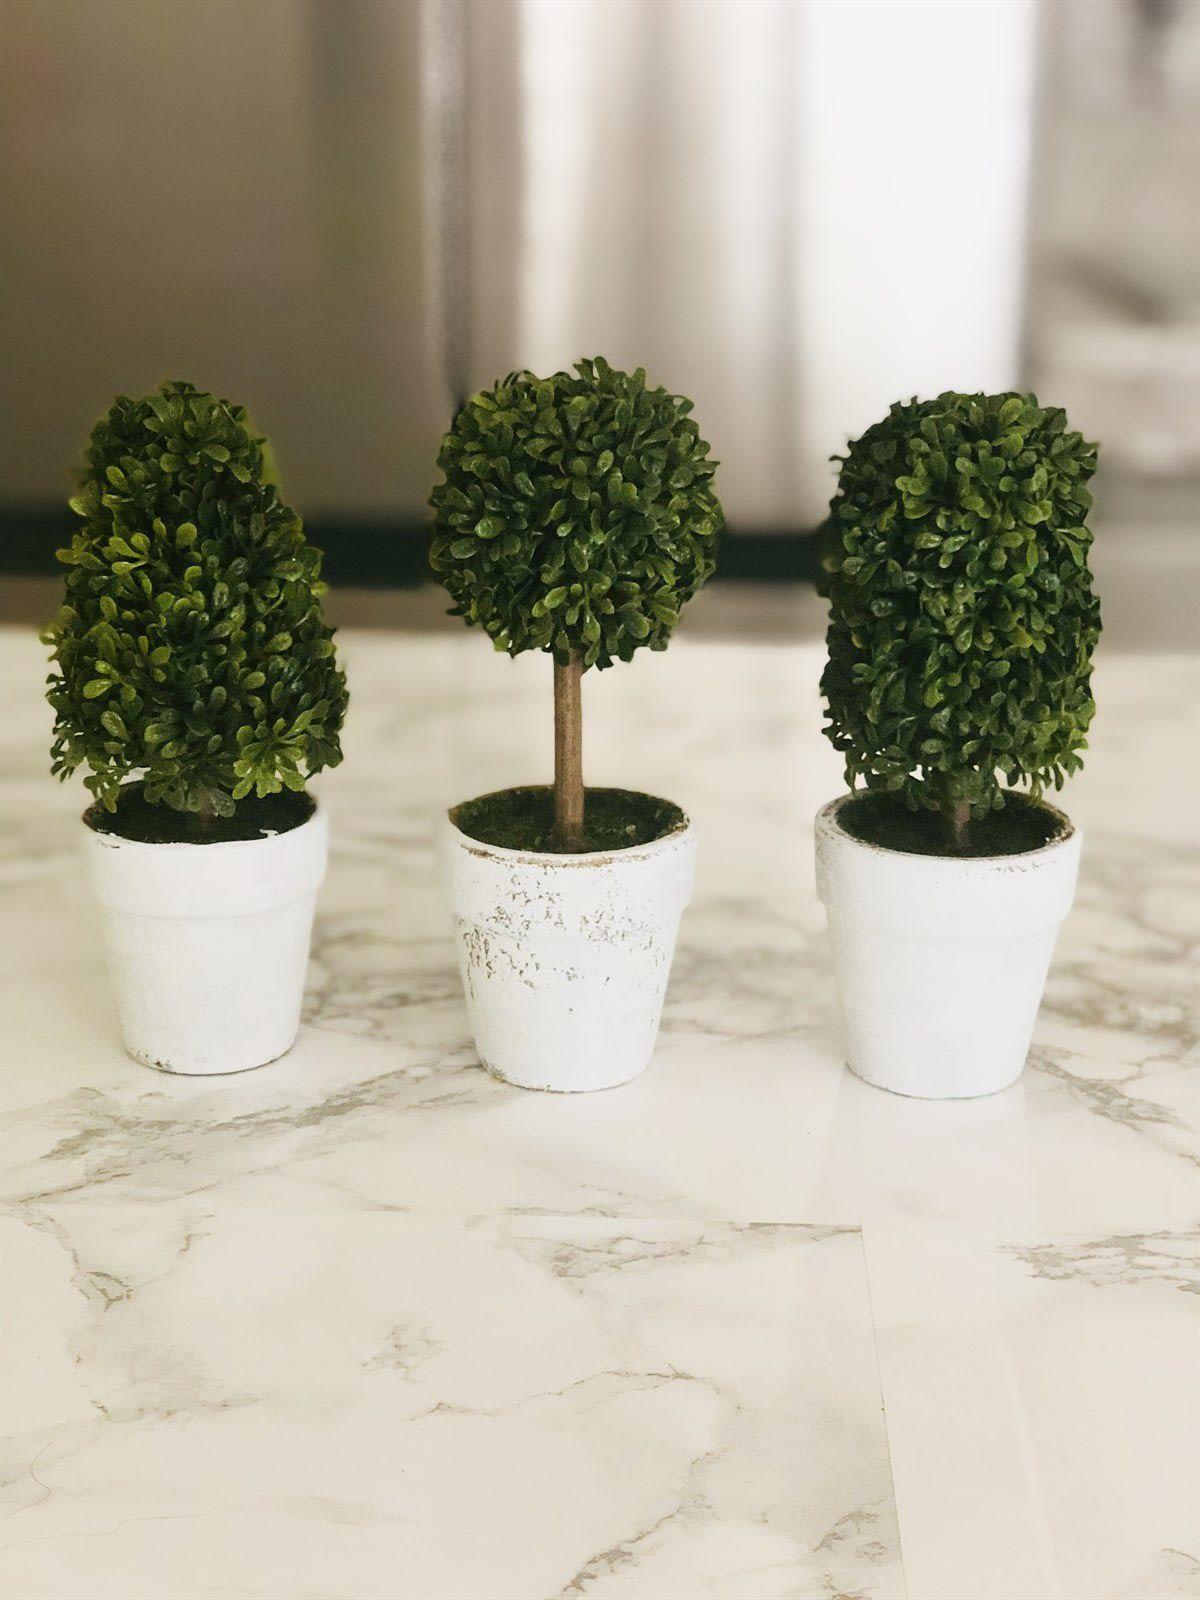 Mini Topiary Trees Set Of 3 Topiary Trees Topiary Decor Topiary